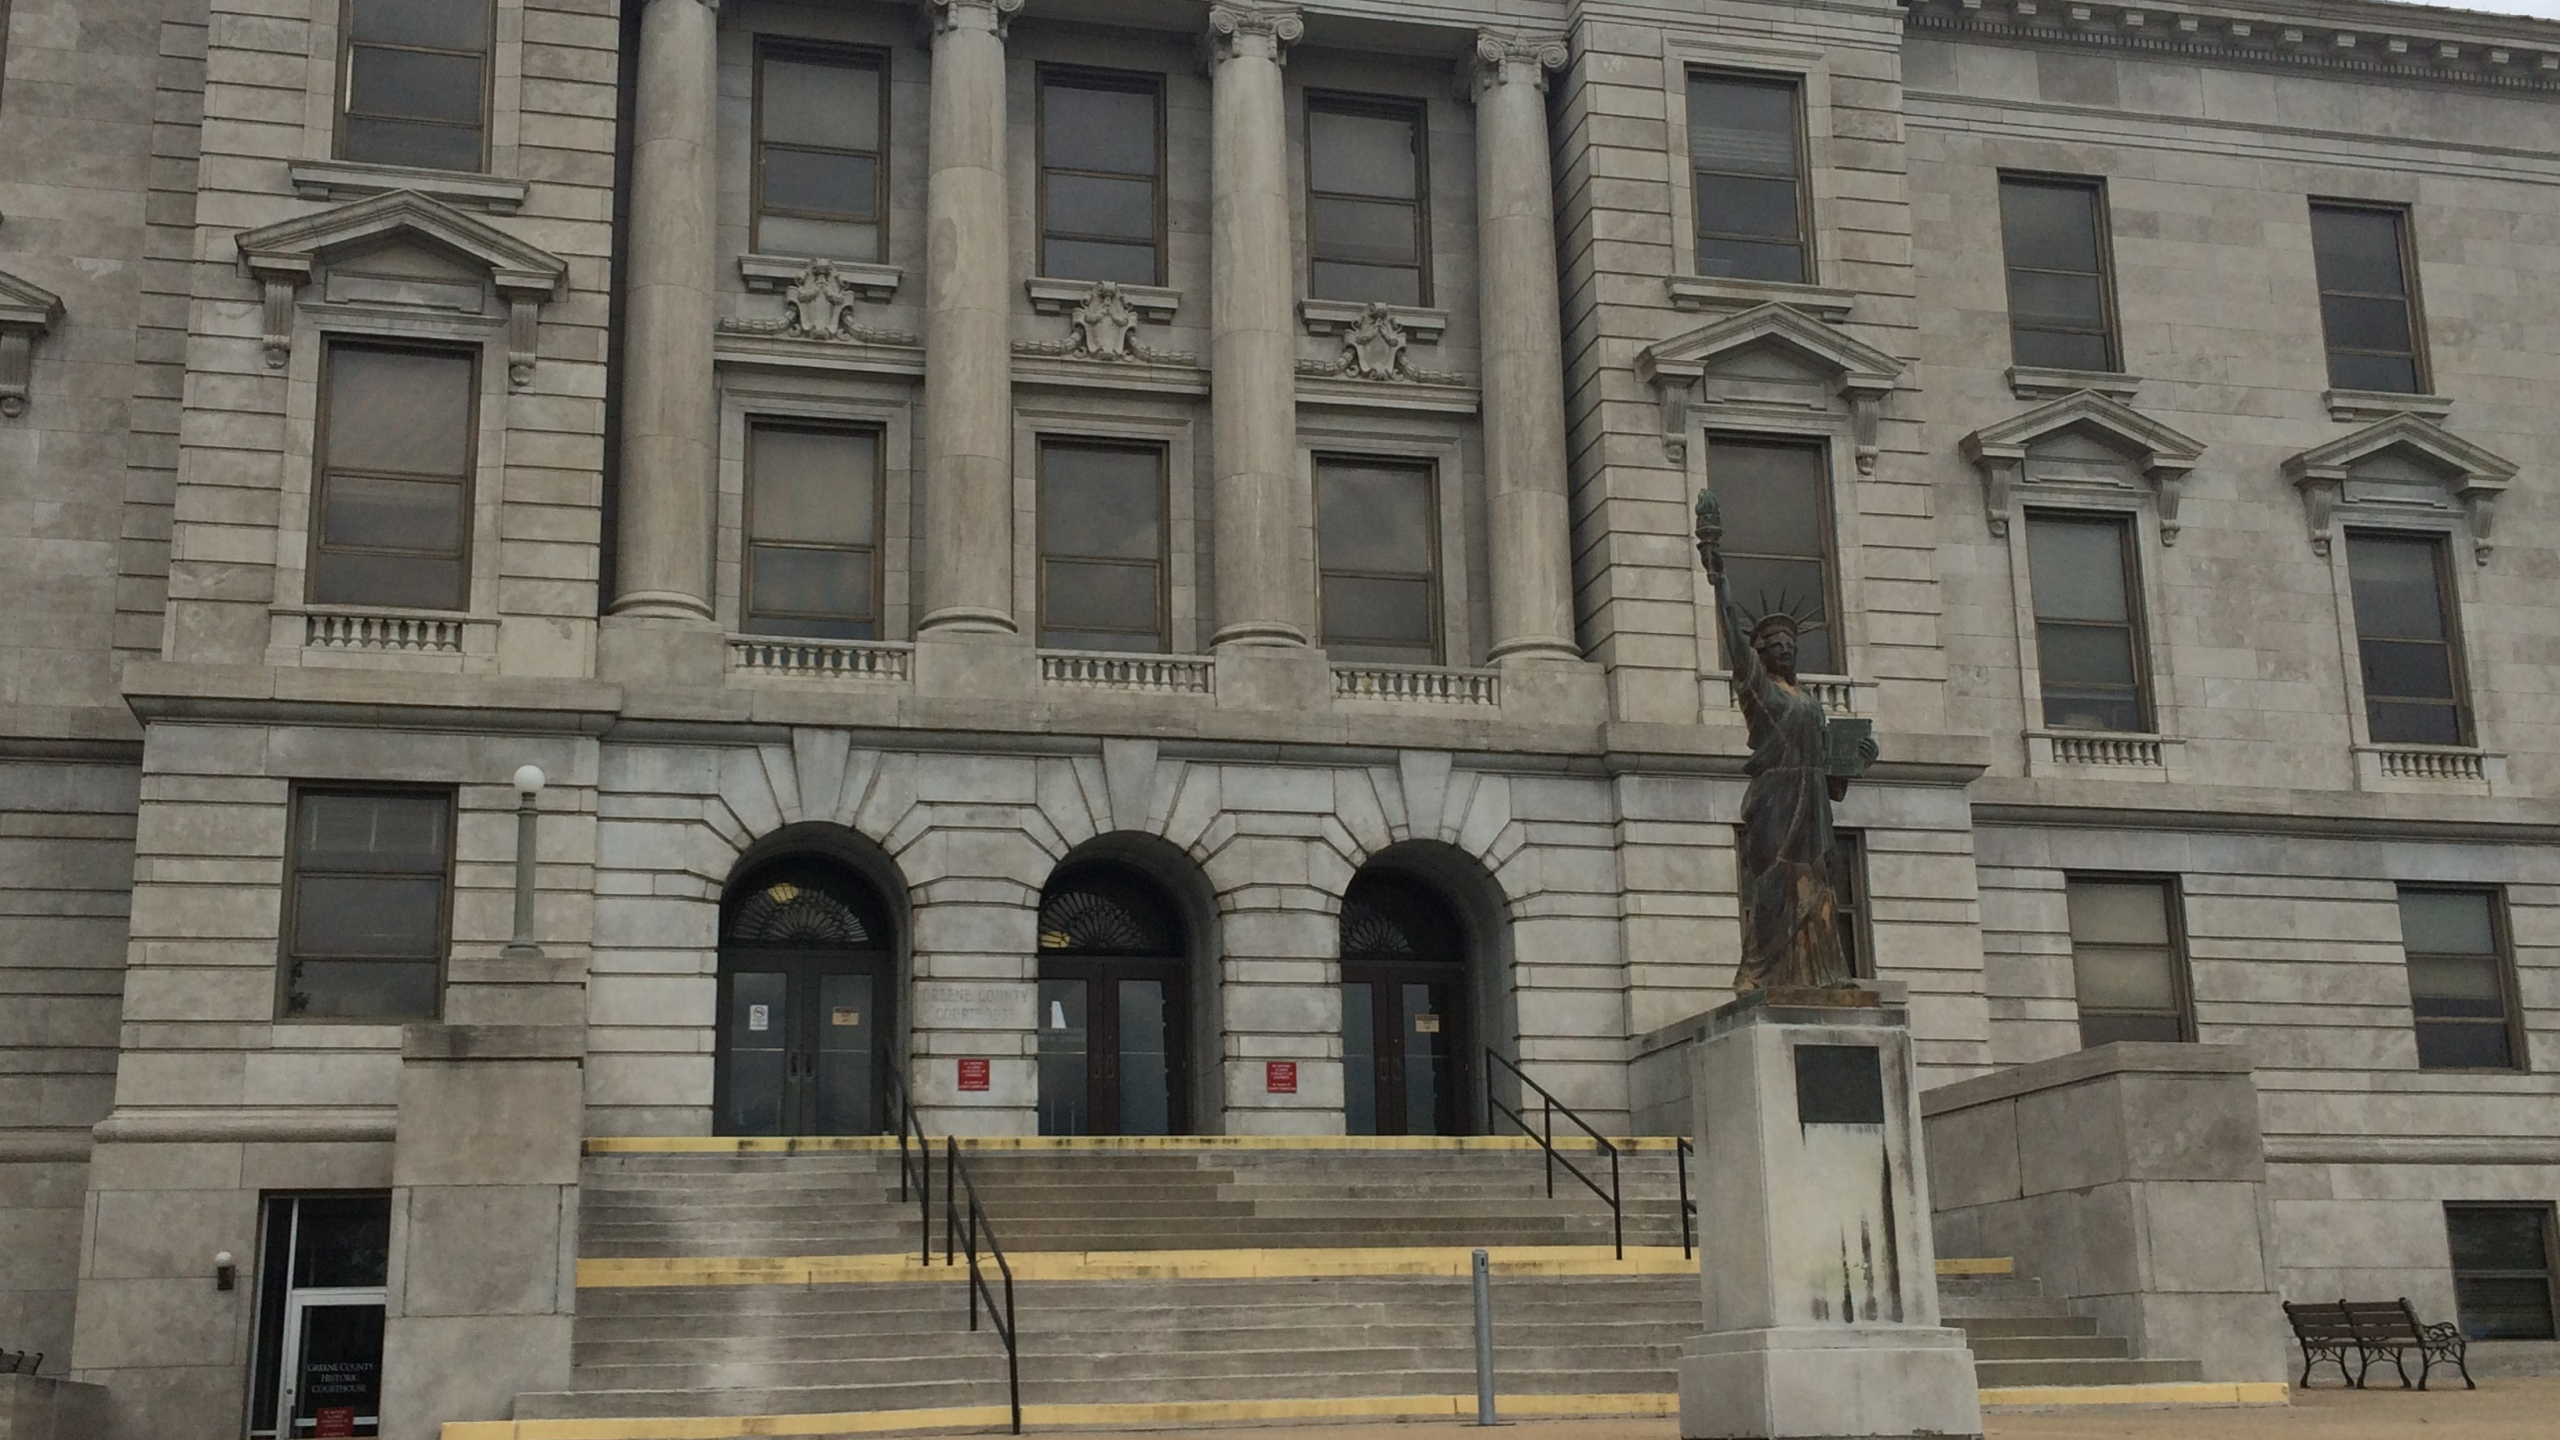 greene county courthouse_1435358528348.JPG